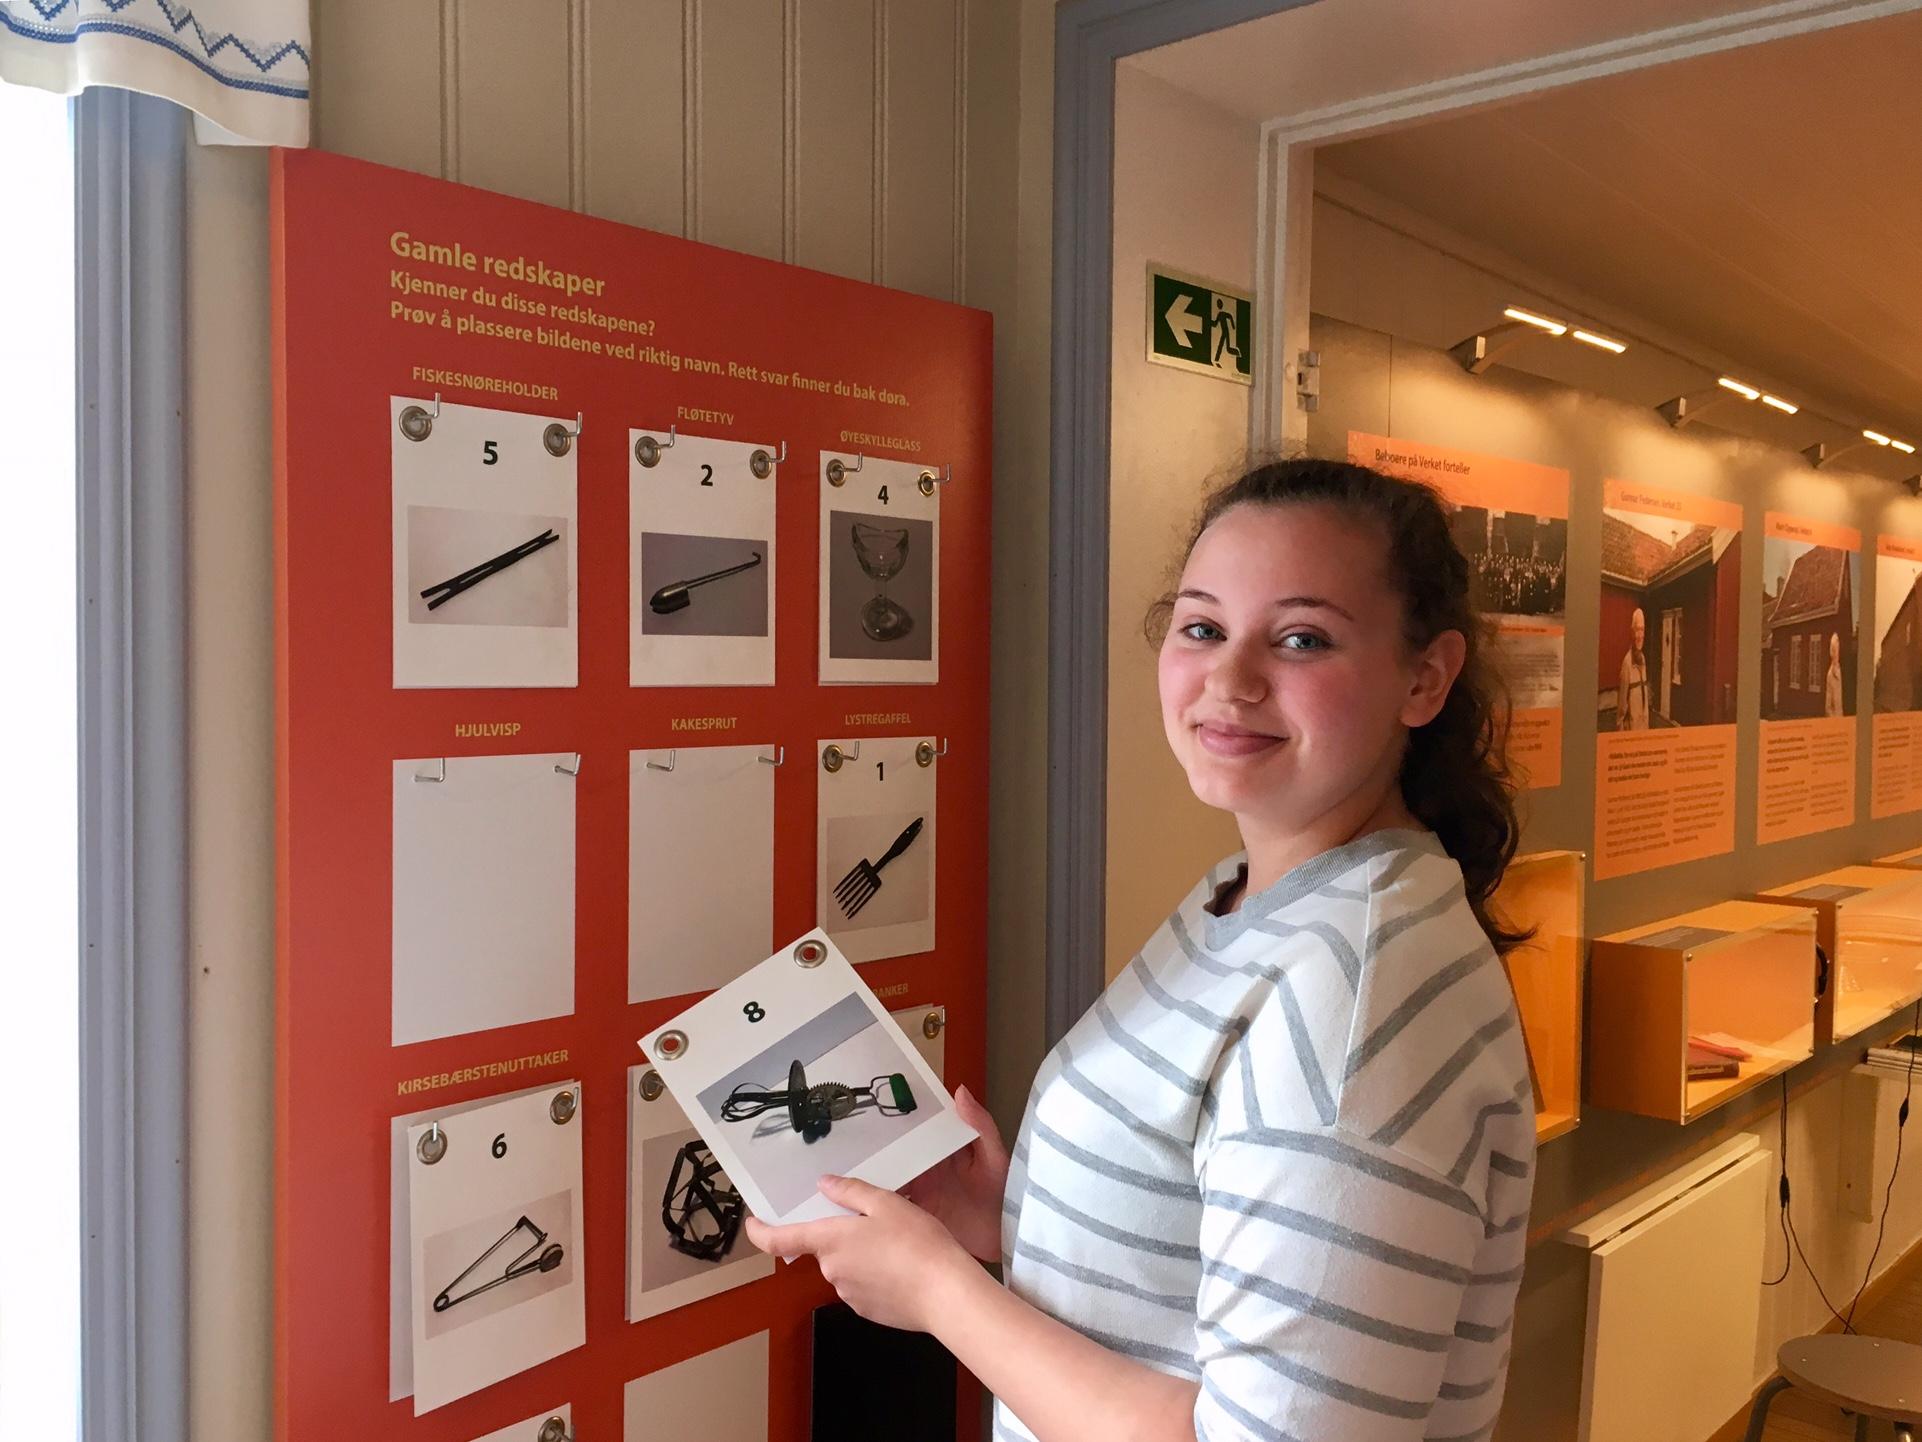 Museumsvert Ayse Akkoca tester sine kjøkkenkunnskaper. Foto: Bjørg Holsvik / Østfoldmuseene